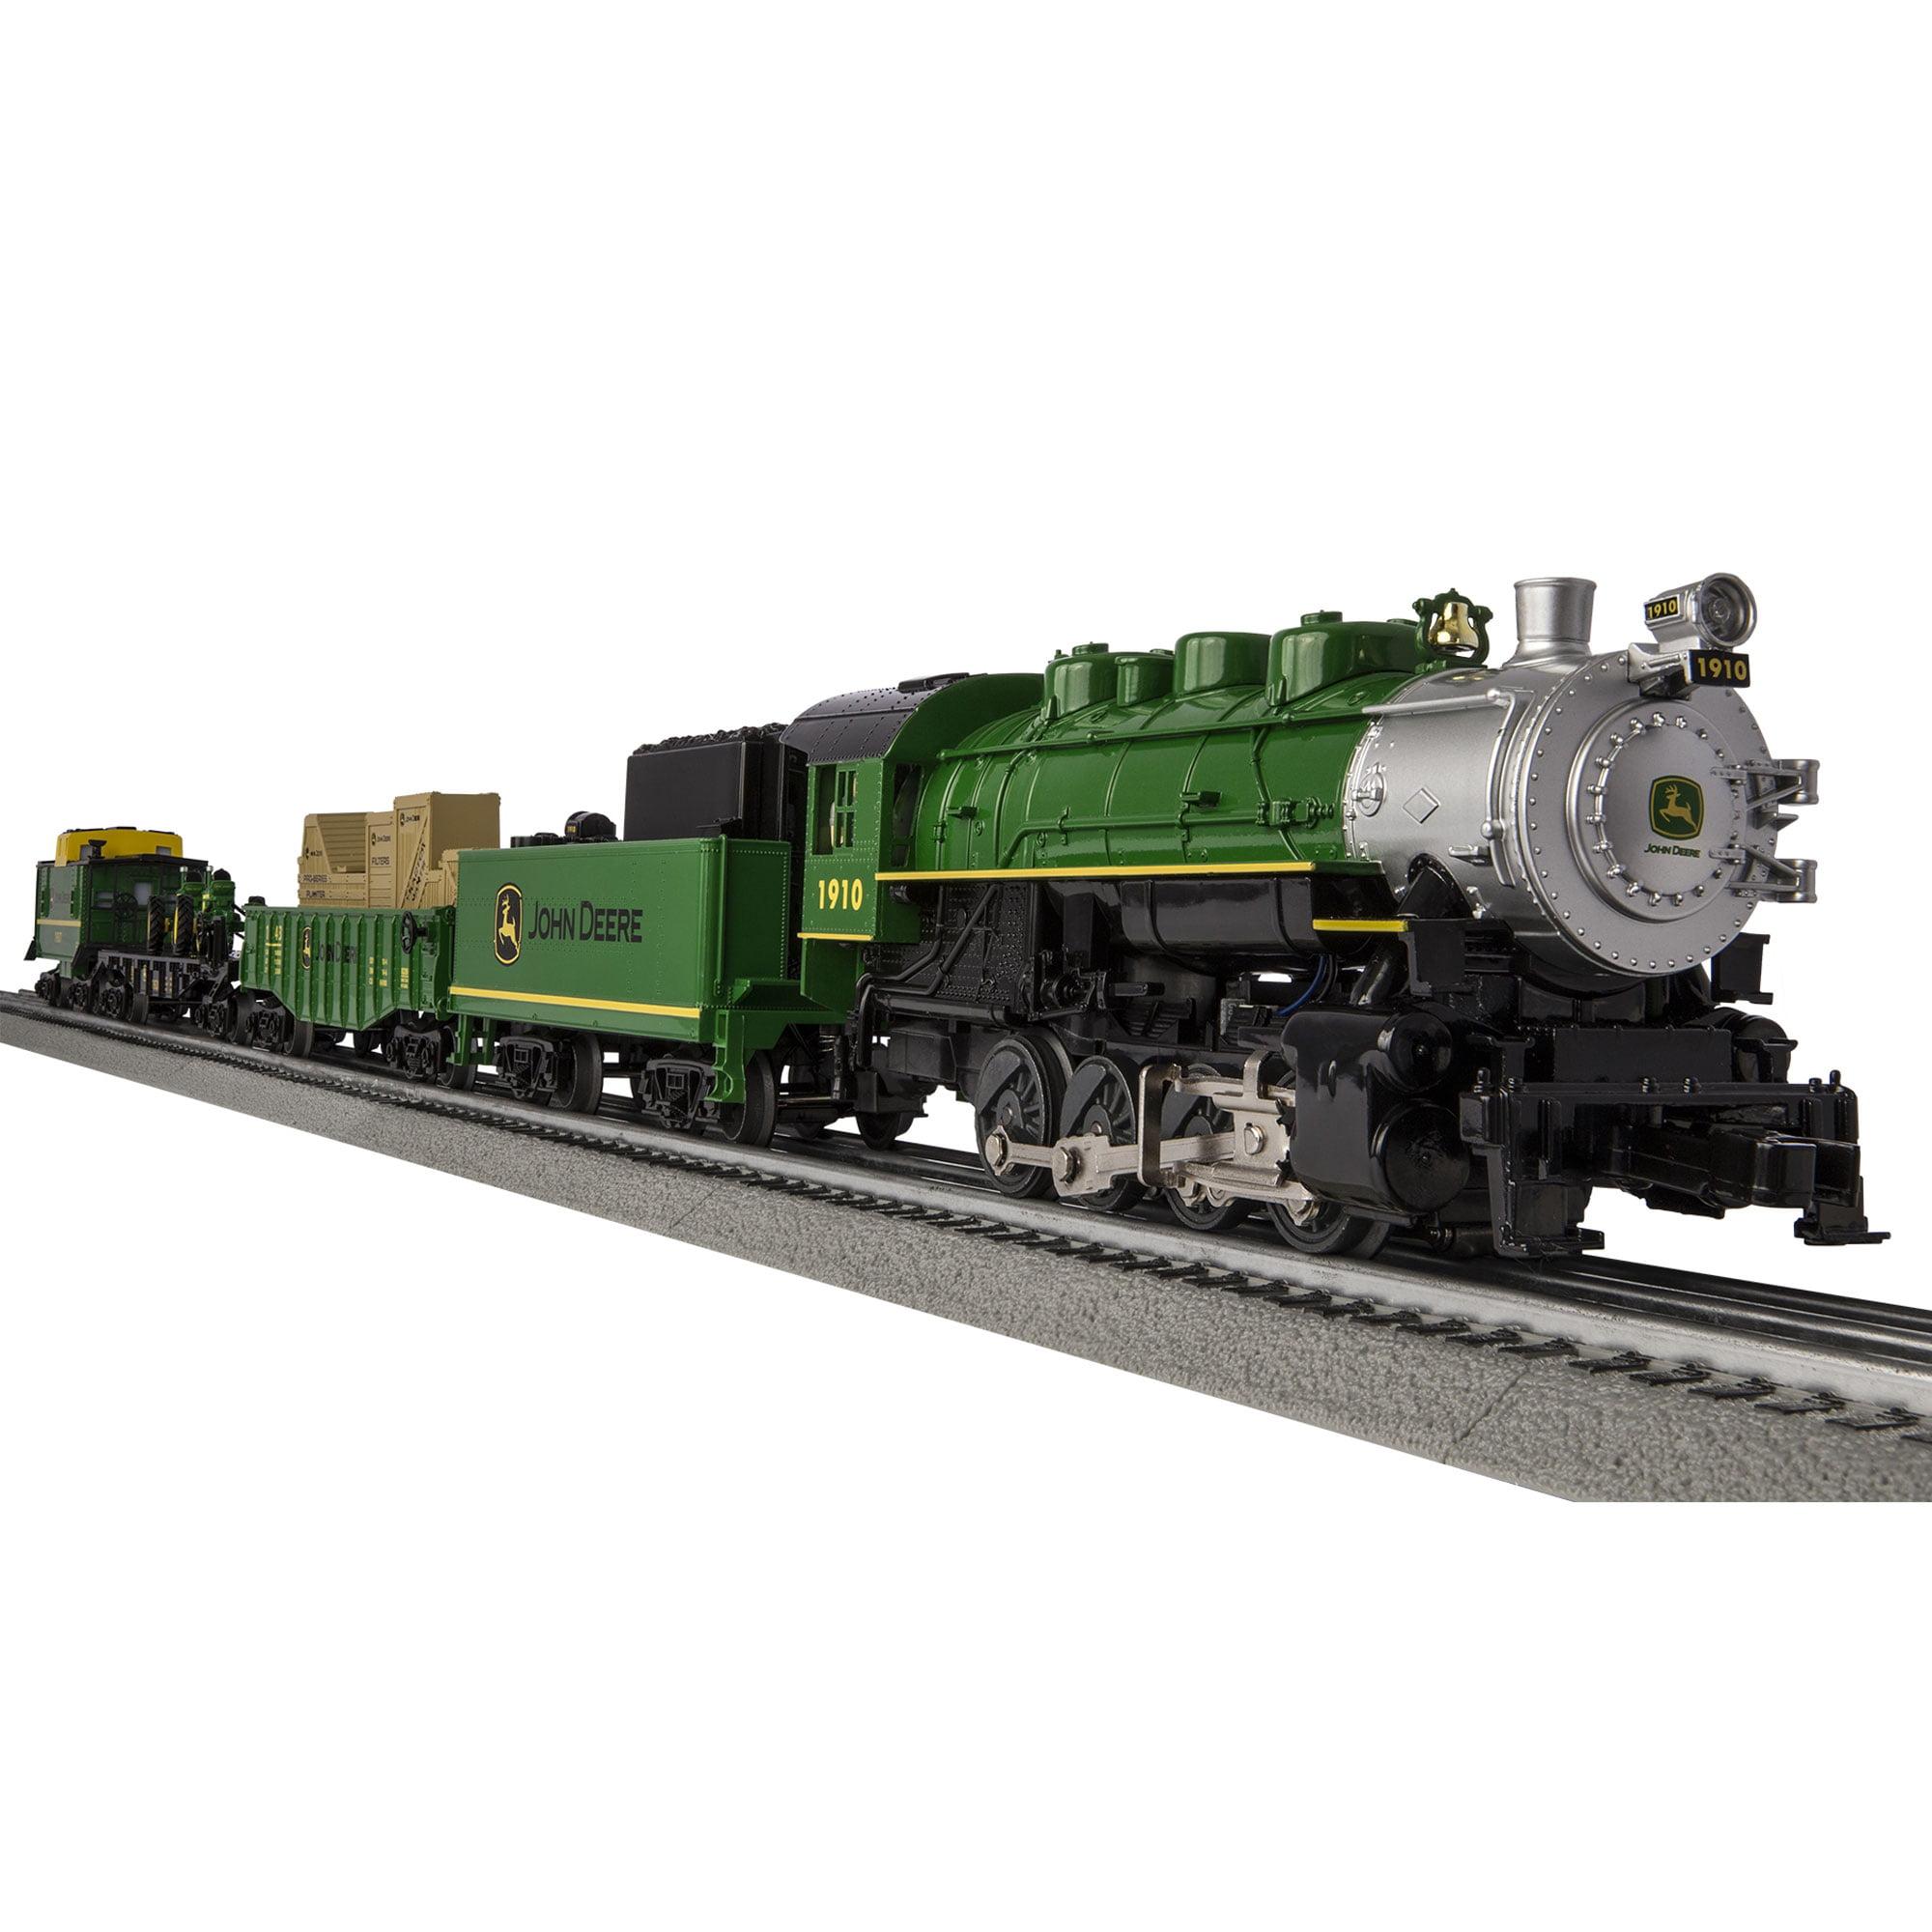 Lionel Trains John Deere LionChief Ready-to-Run Train Set